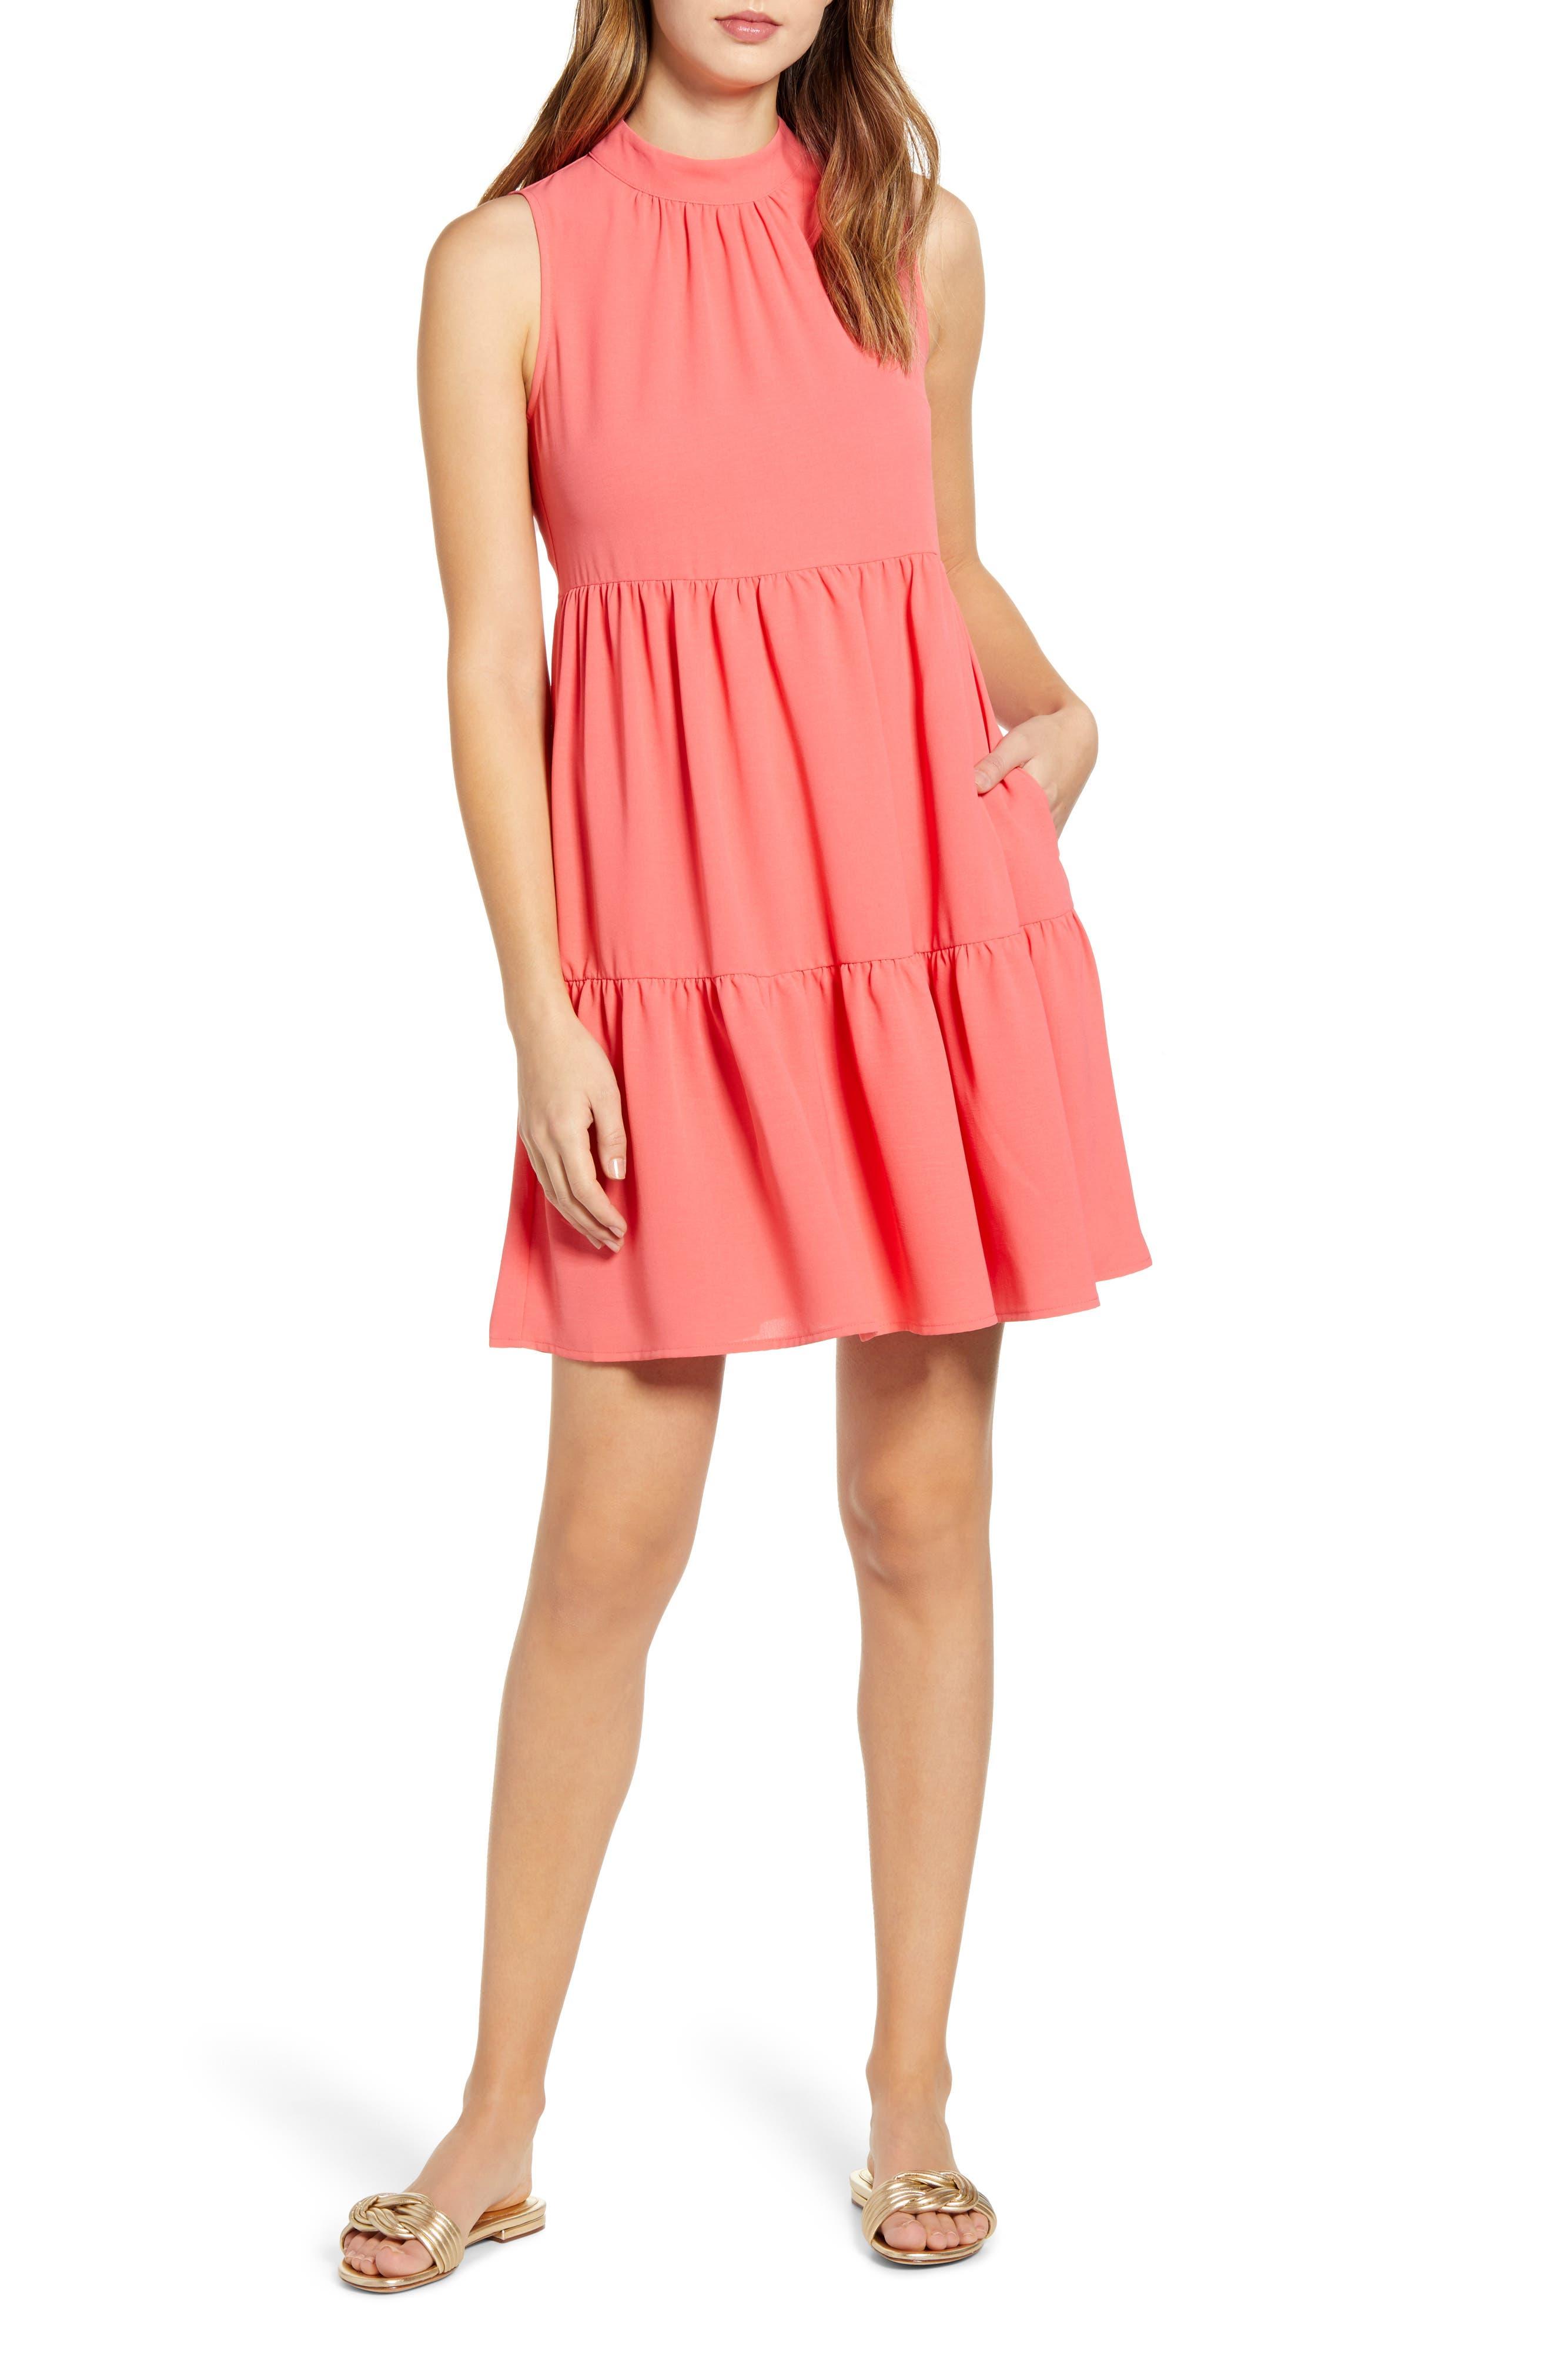 American Living Womens Misses Lace High Waist Dress SZ 6 Nude Ruffle 3//4 Sleeve